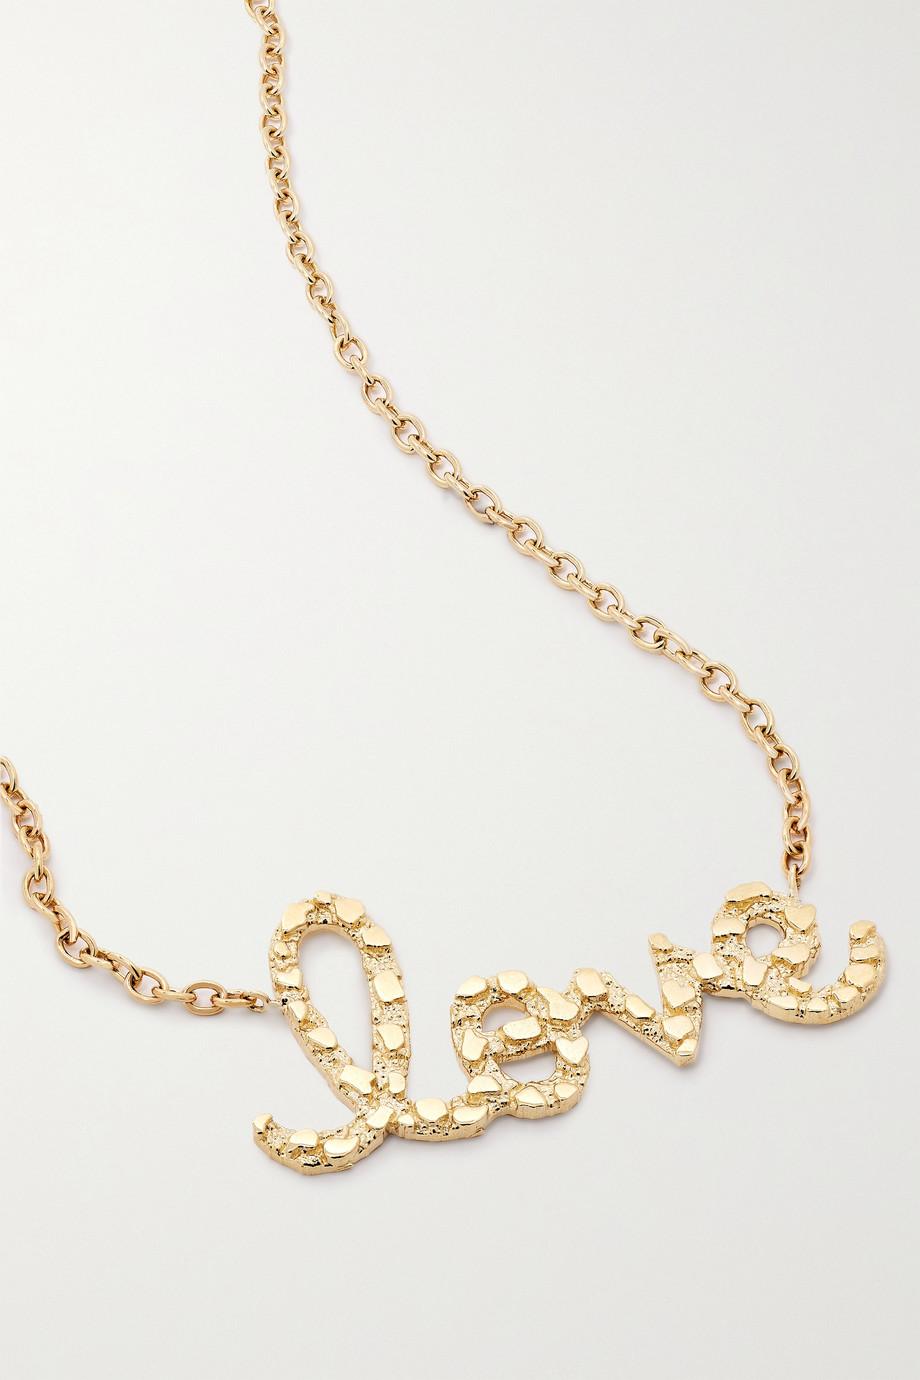 Sydney Evan Collier en or 14 carats (585/1000) Love Script Extra Large